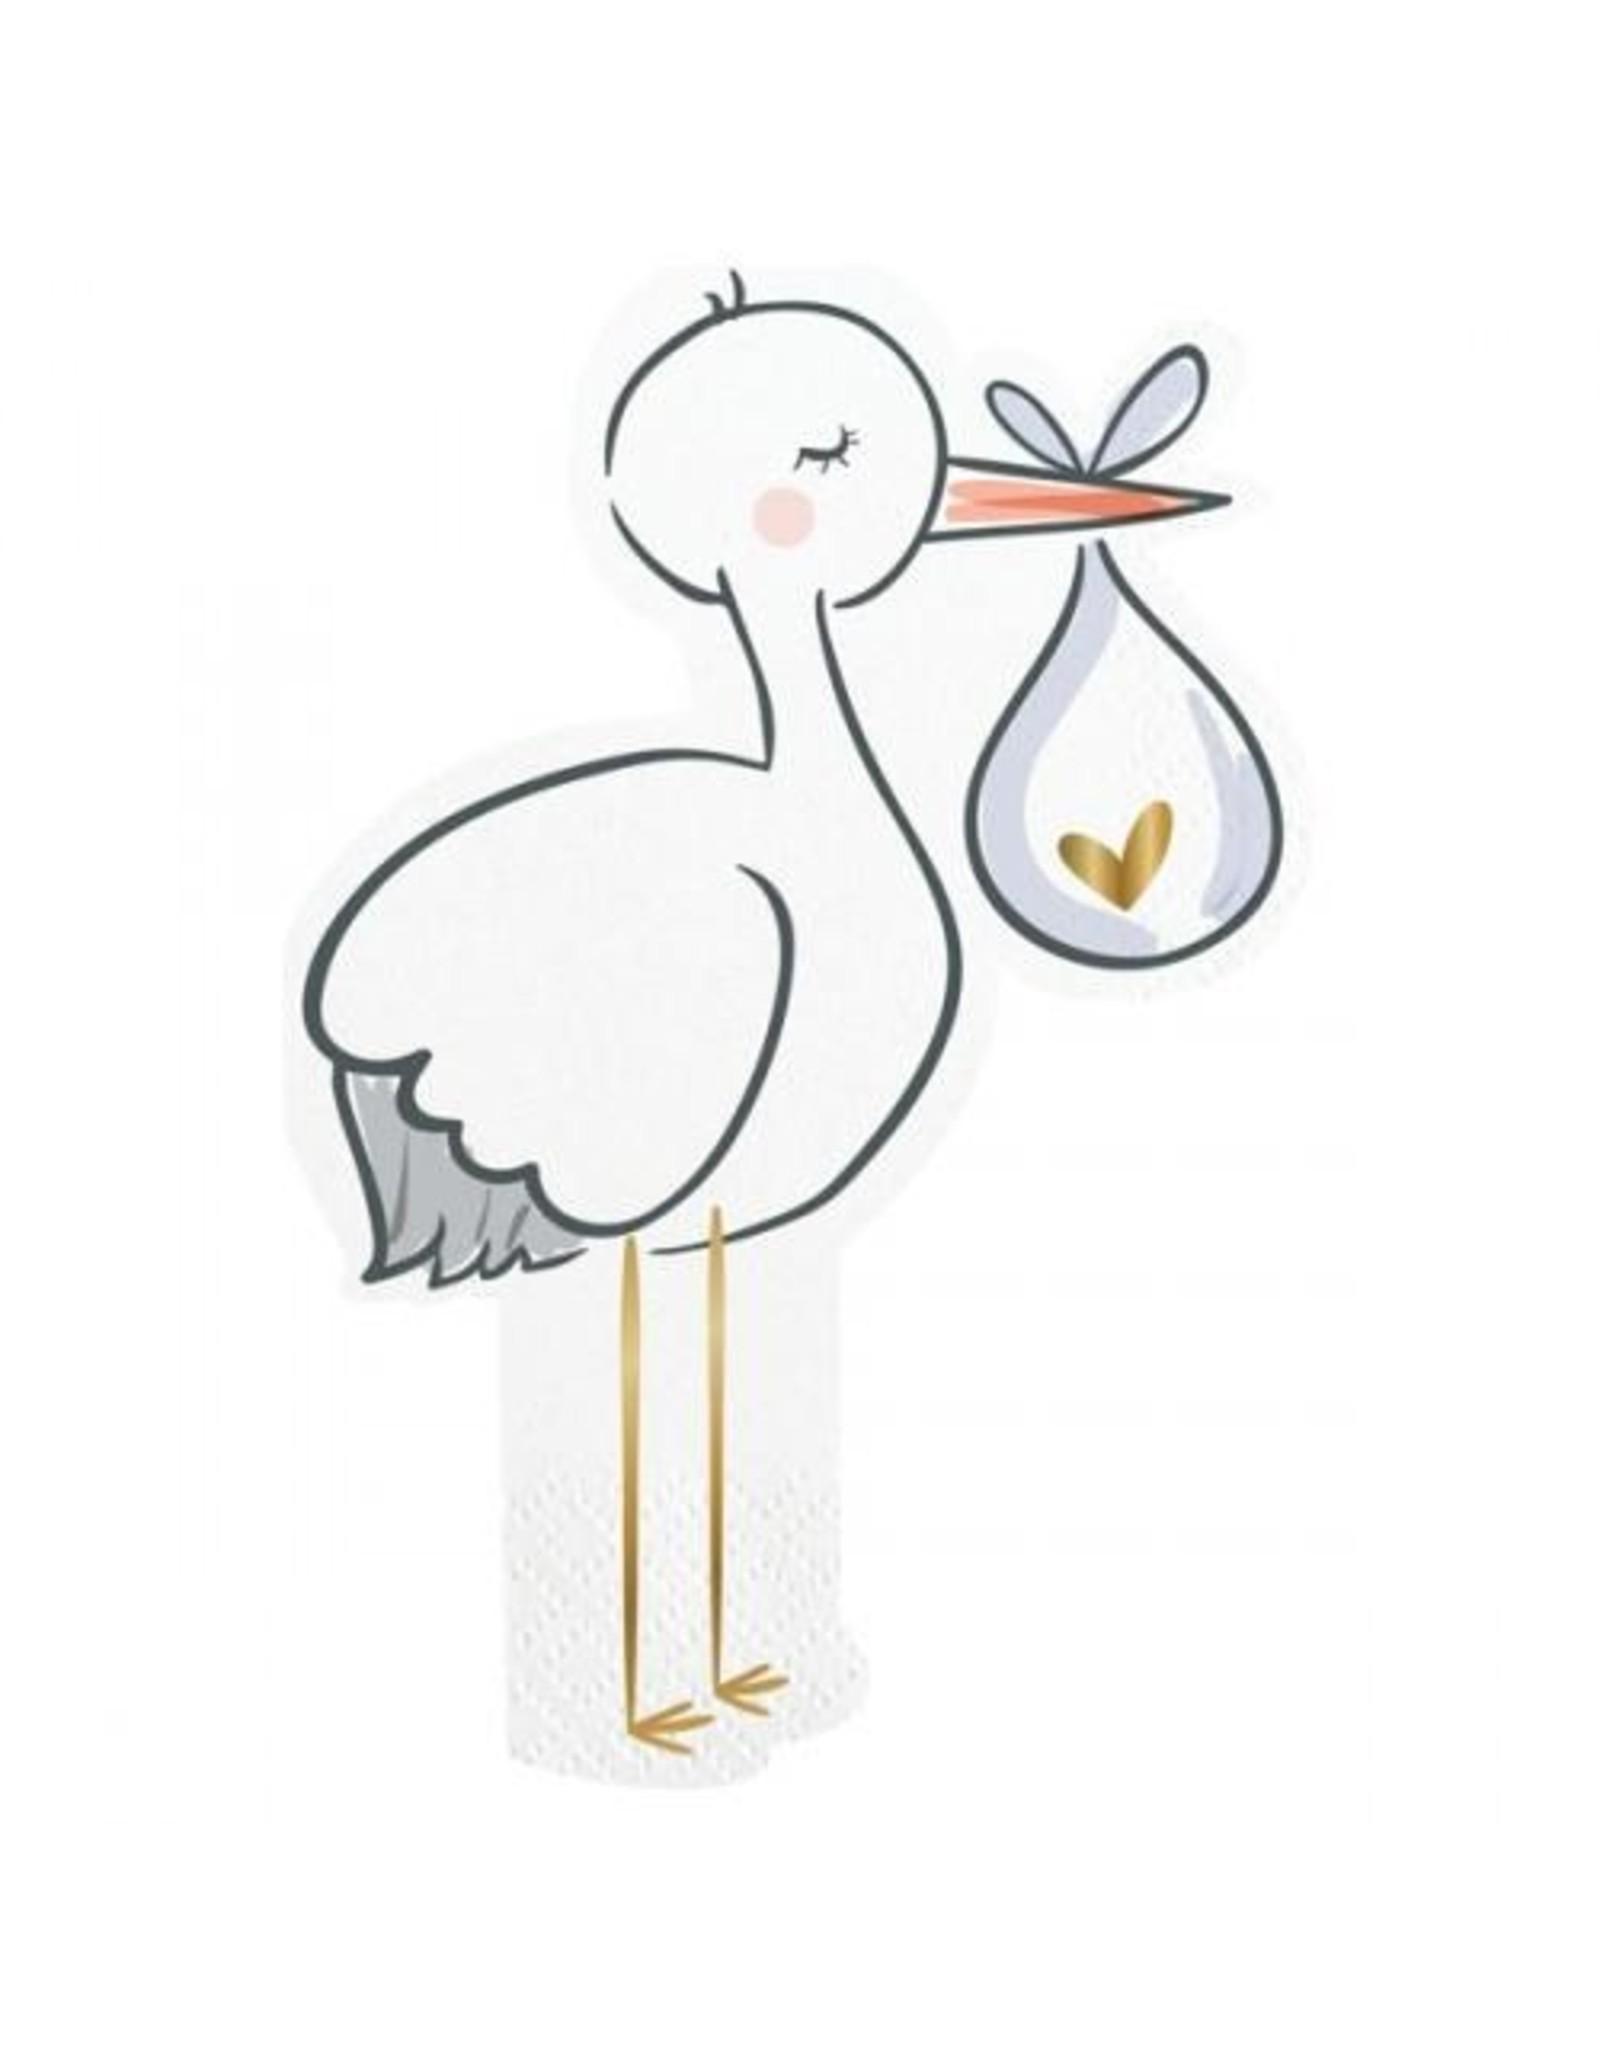 20 ct. Stork Shaped Napkins